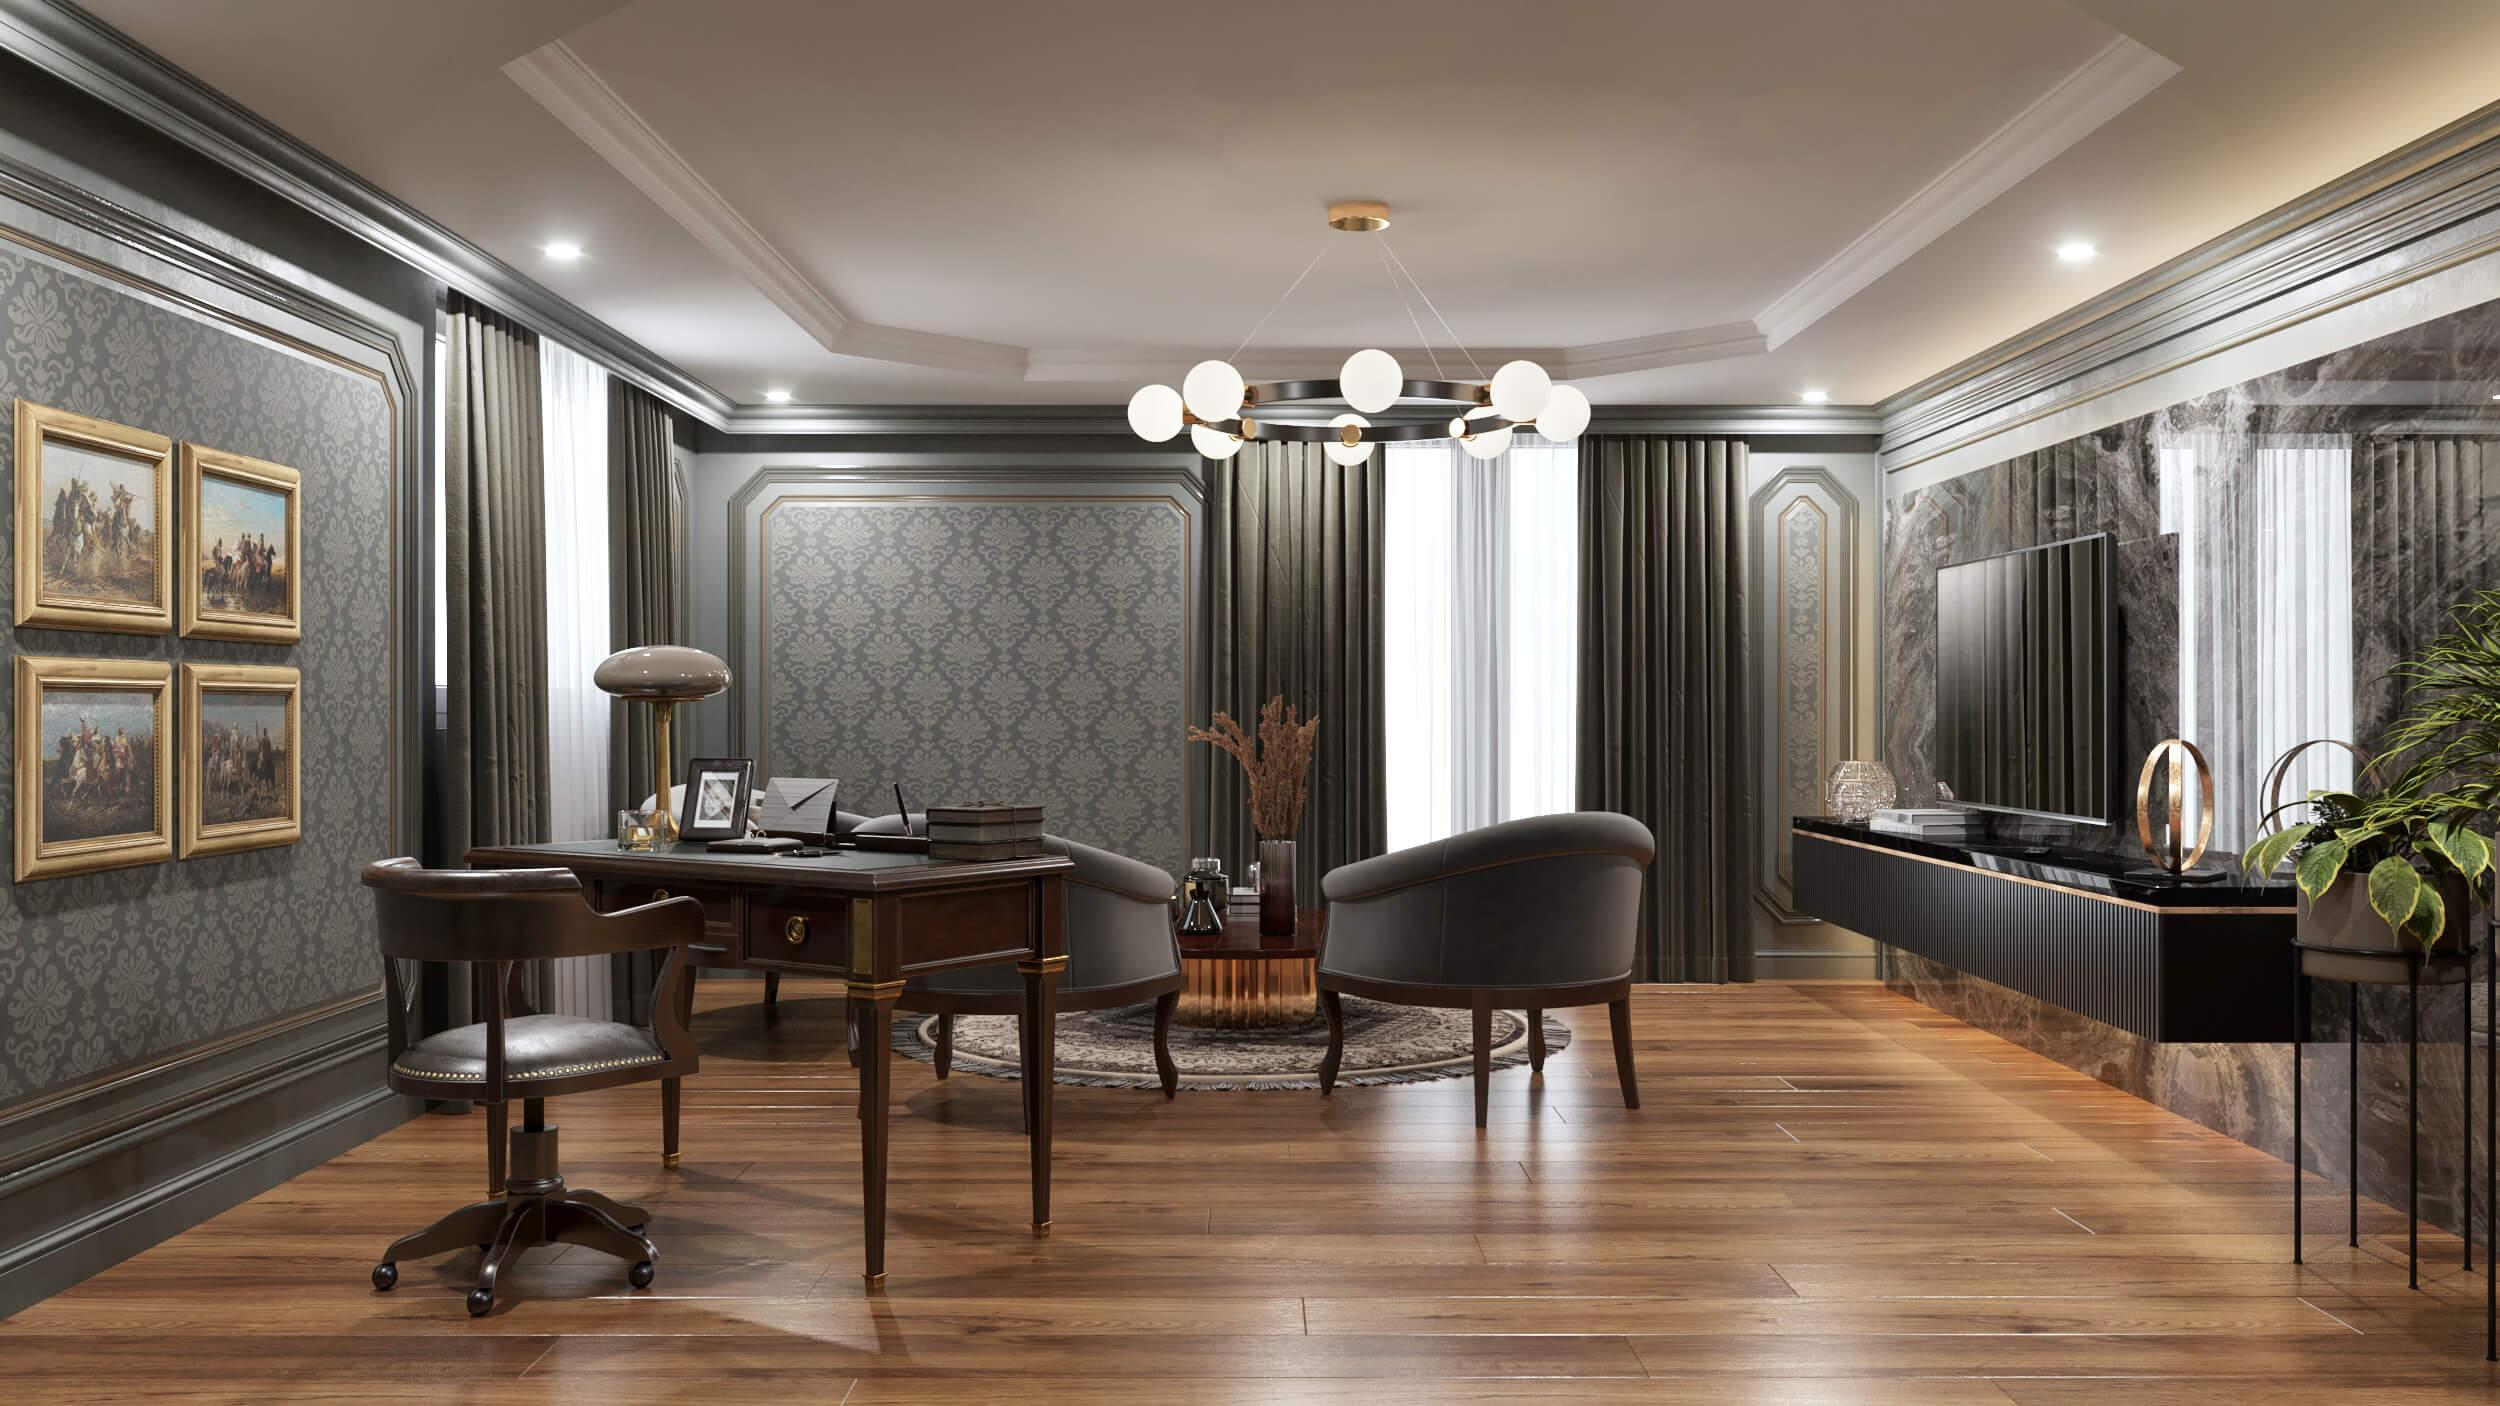 Vantage umitkoy 4361 A. Kucukoz House Residential